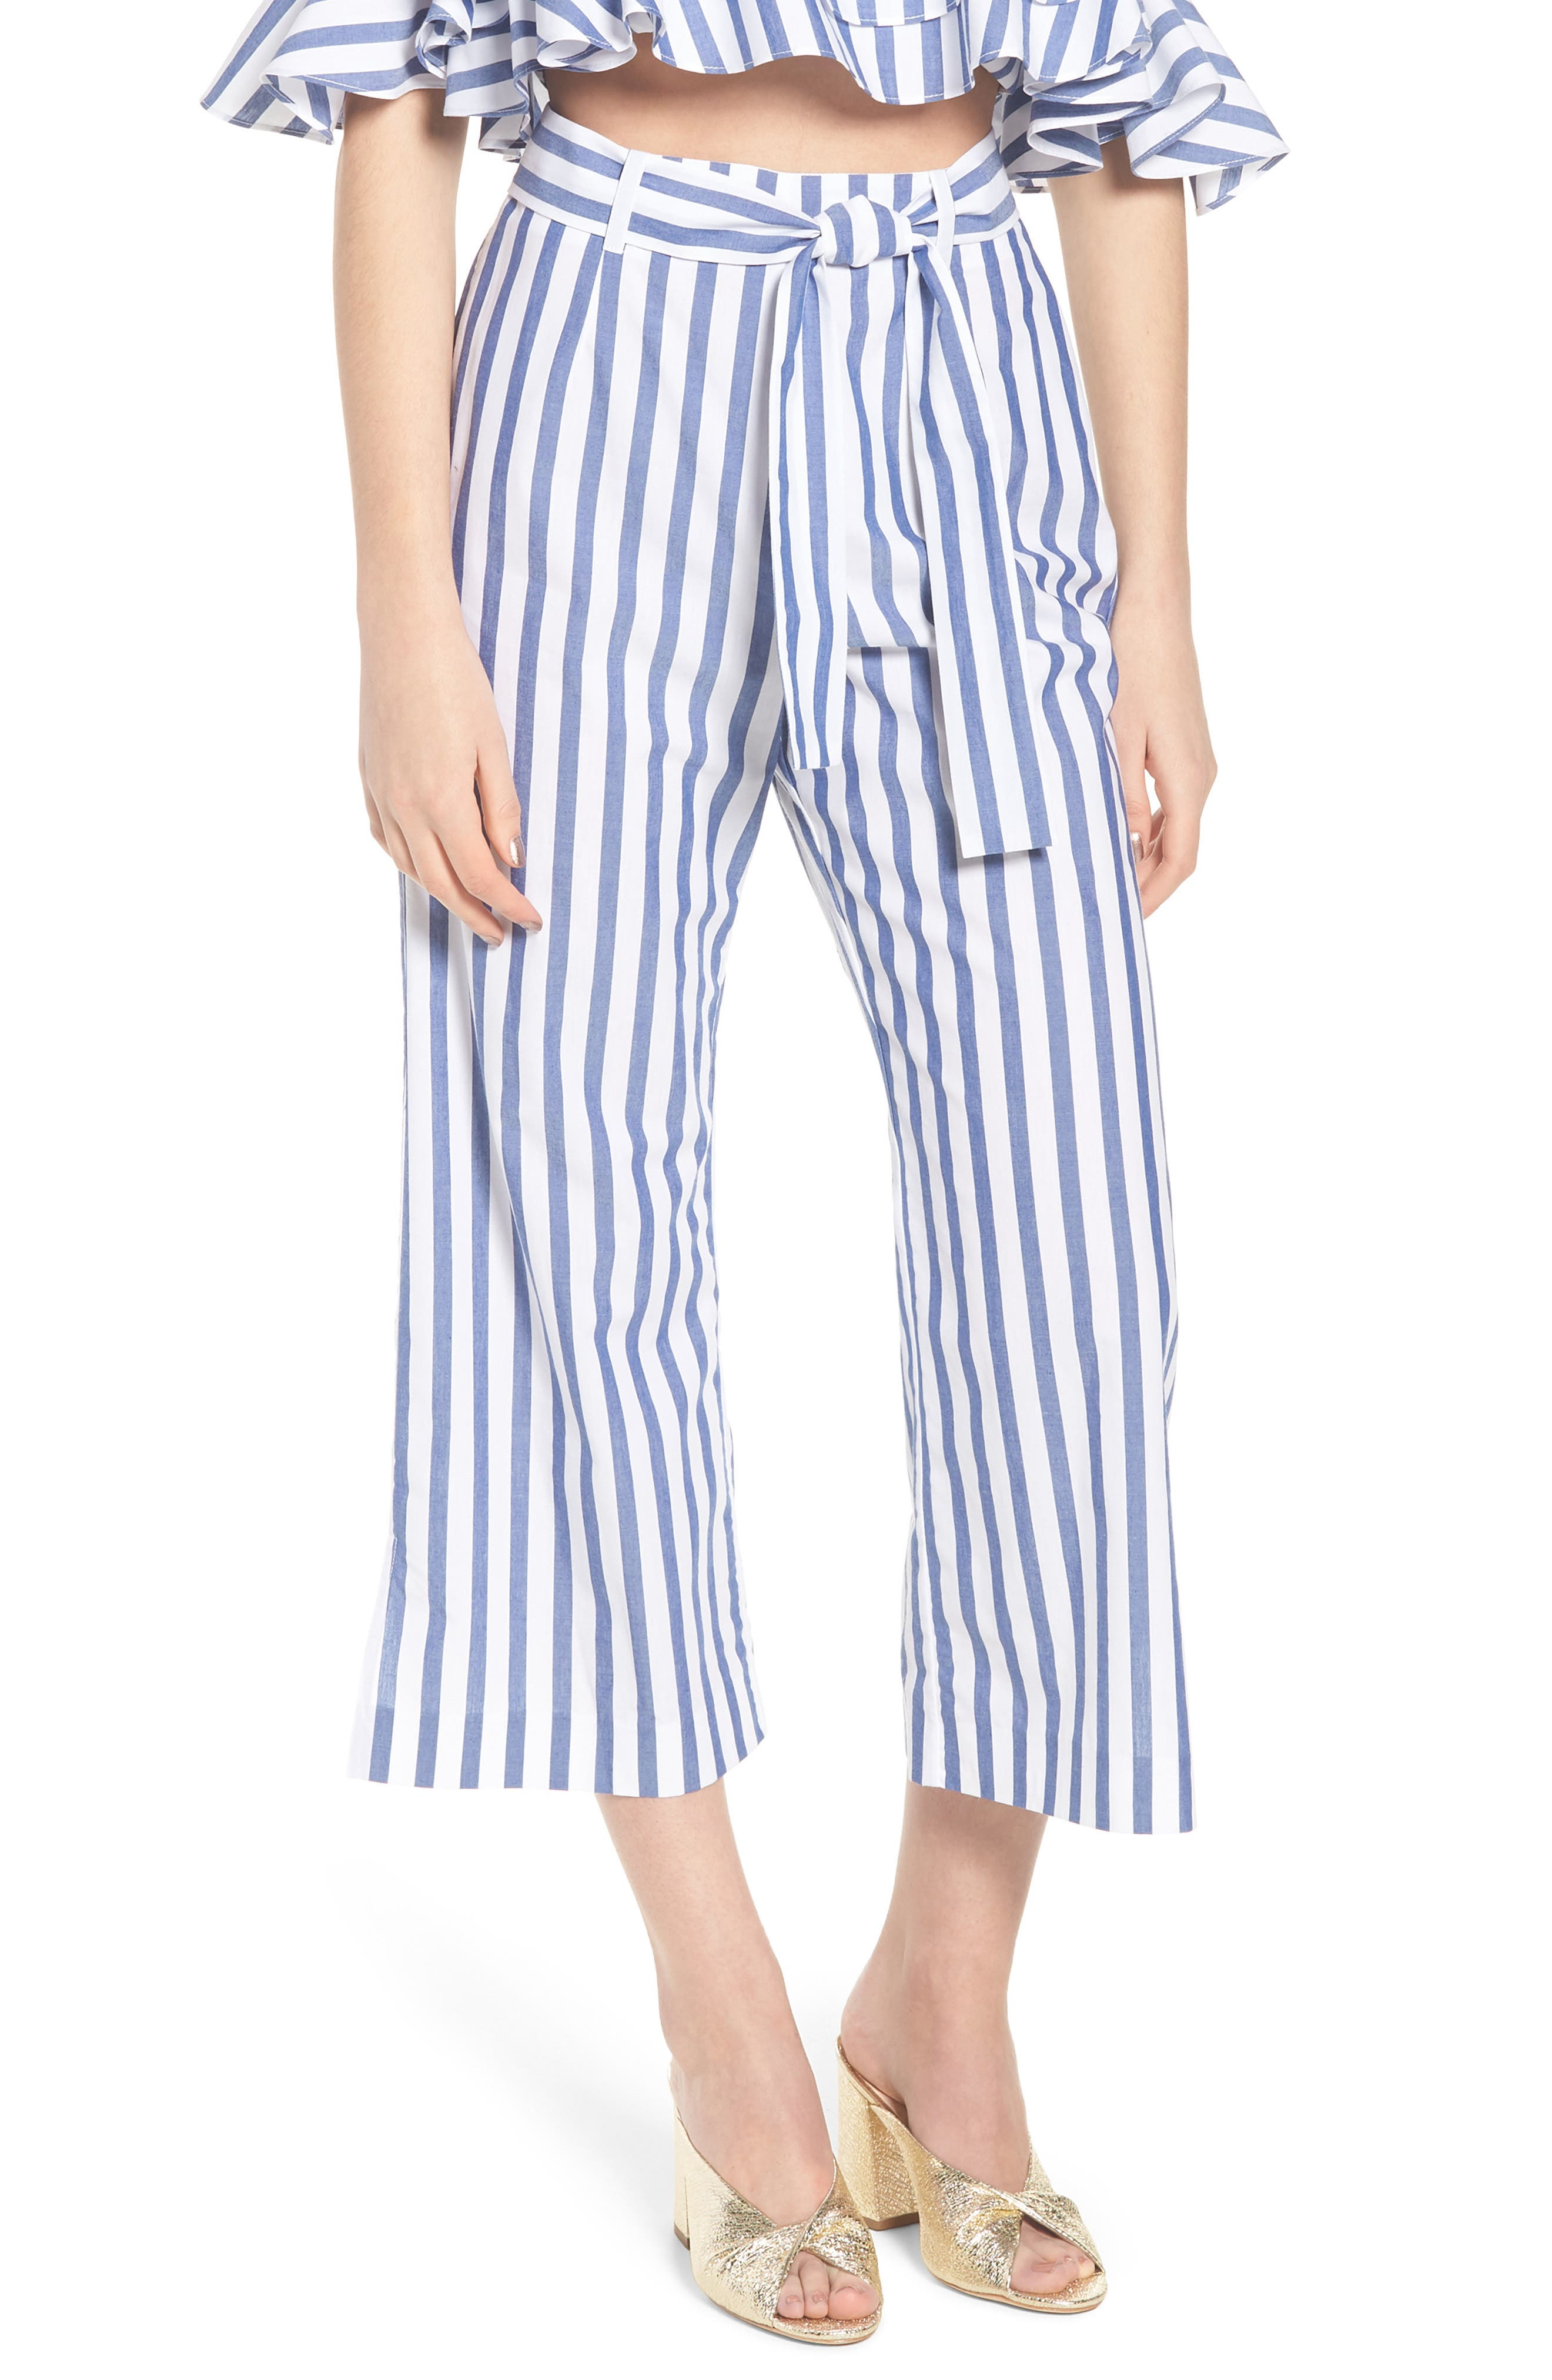 Aversa Crop Wide Leg Pants,                         Main,                         color, Navy Stripe